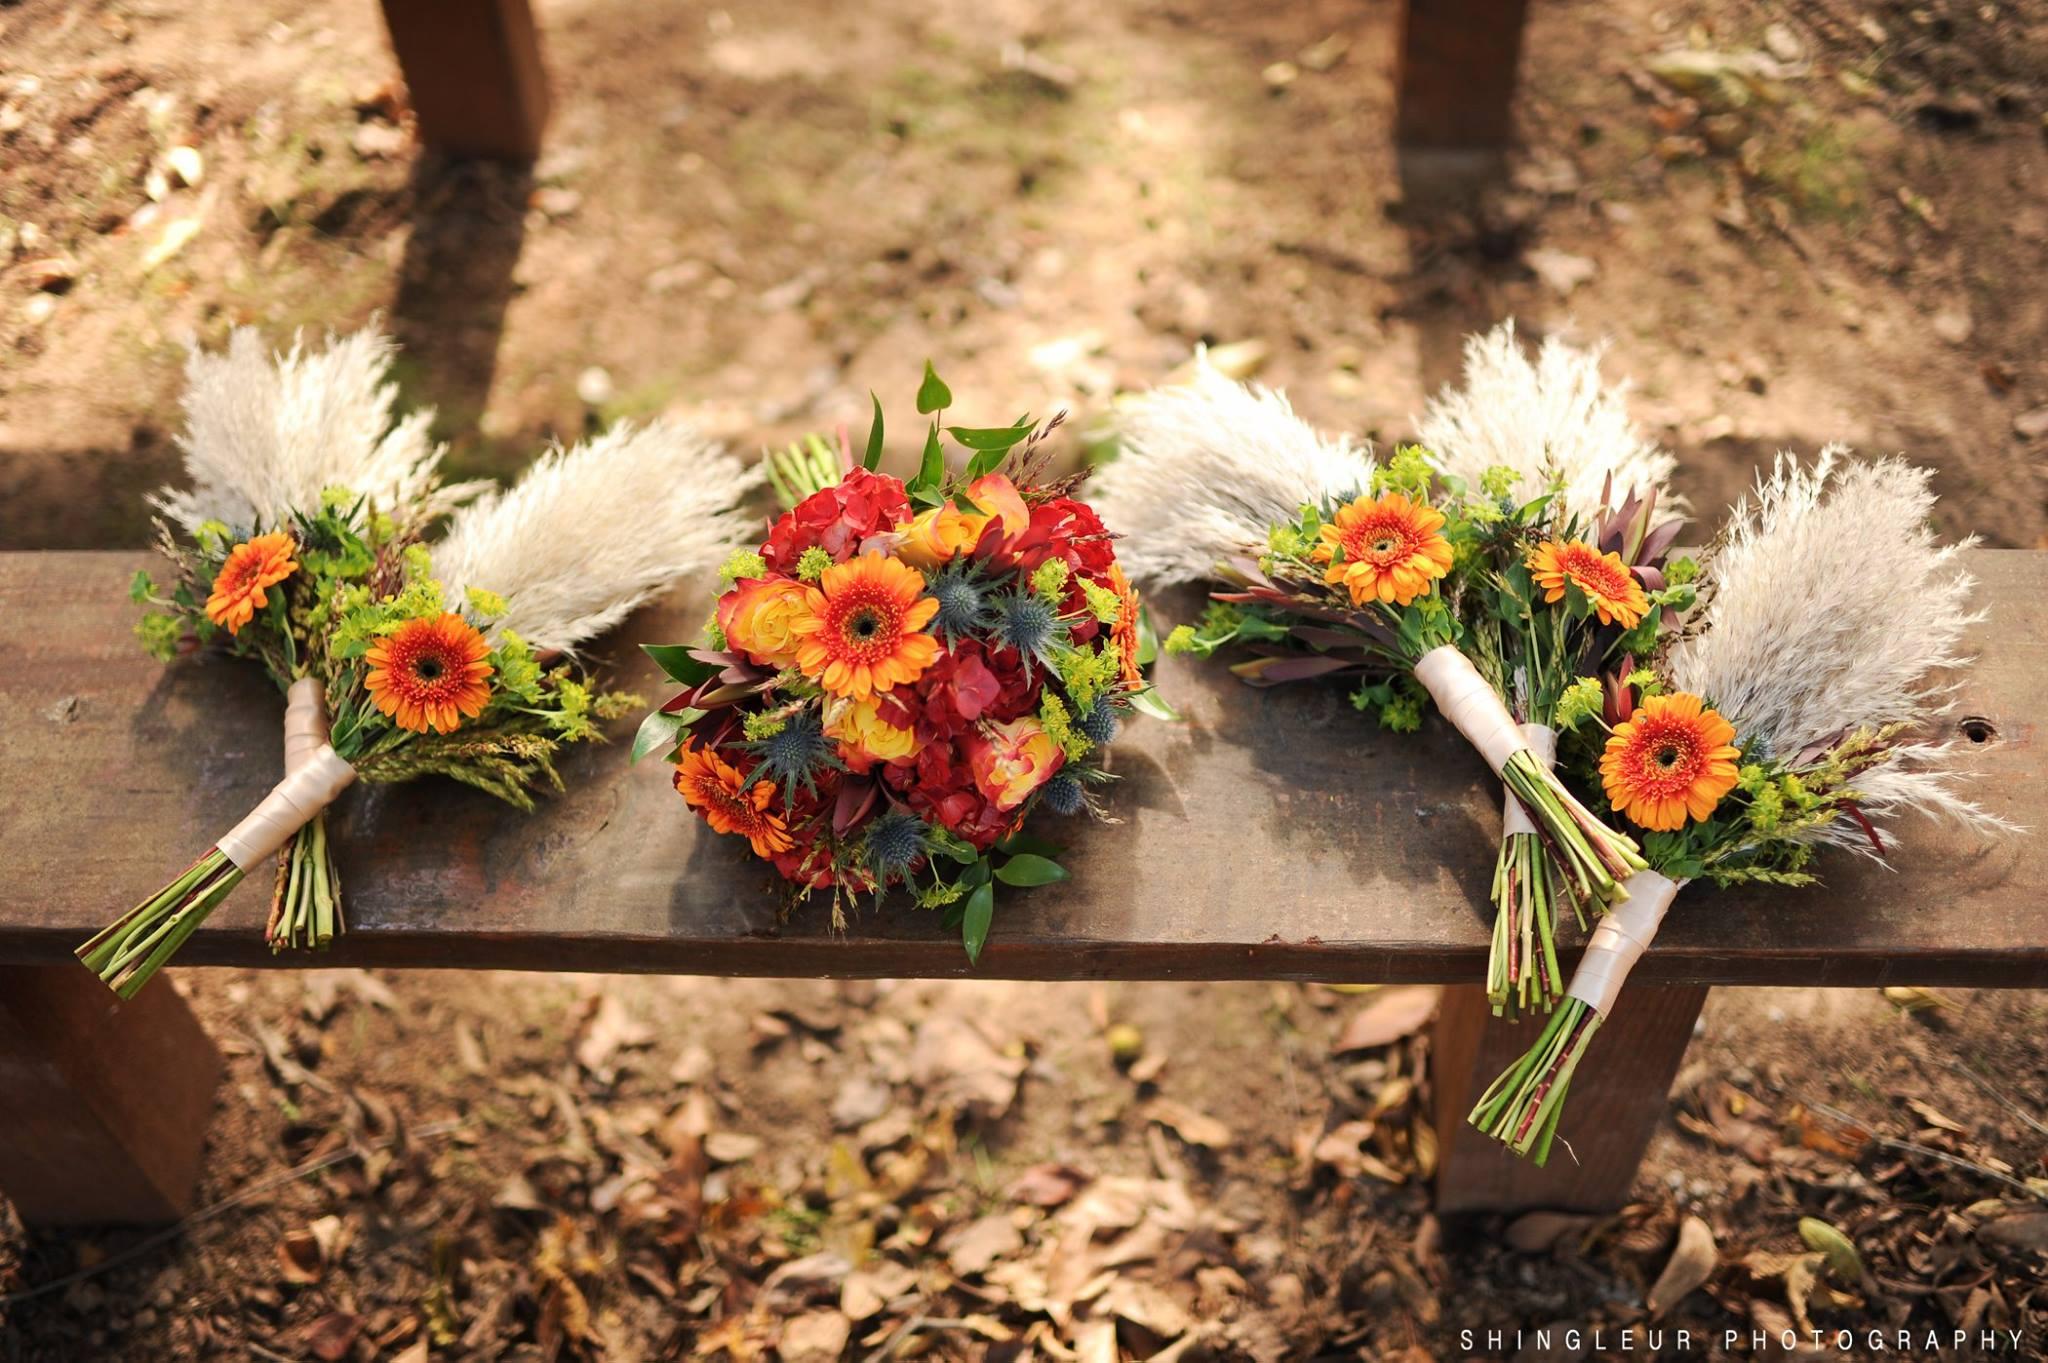 Shingleur Photography , from  Hatley + Charles ' wedding